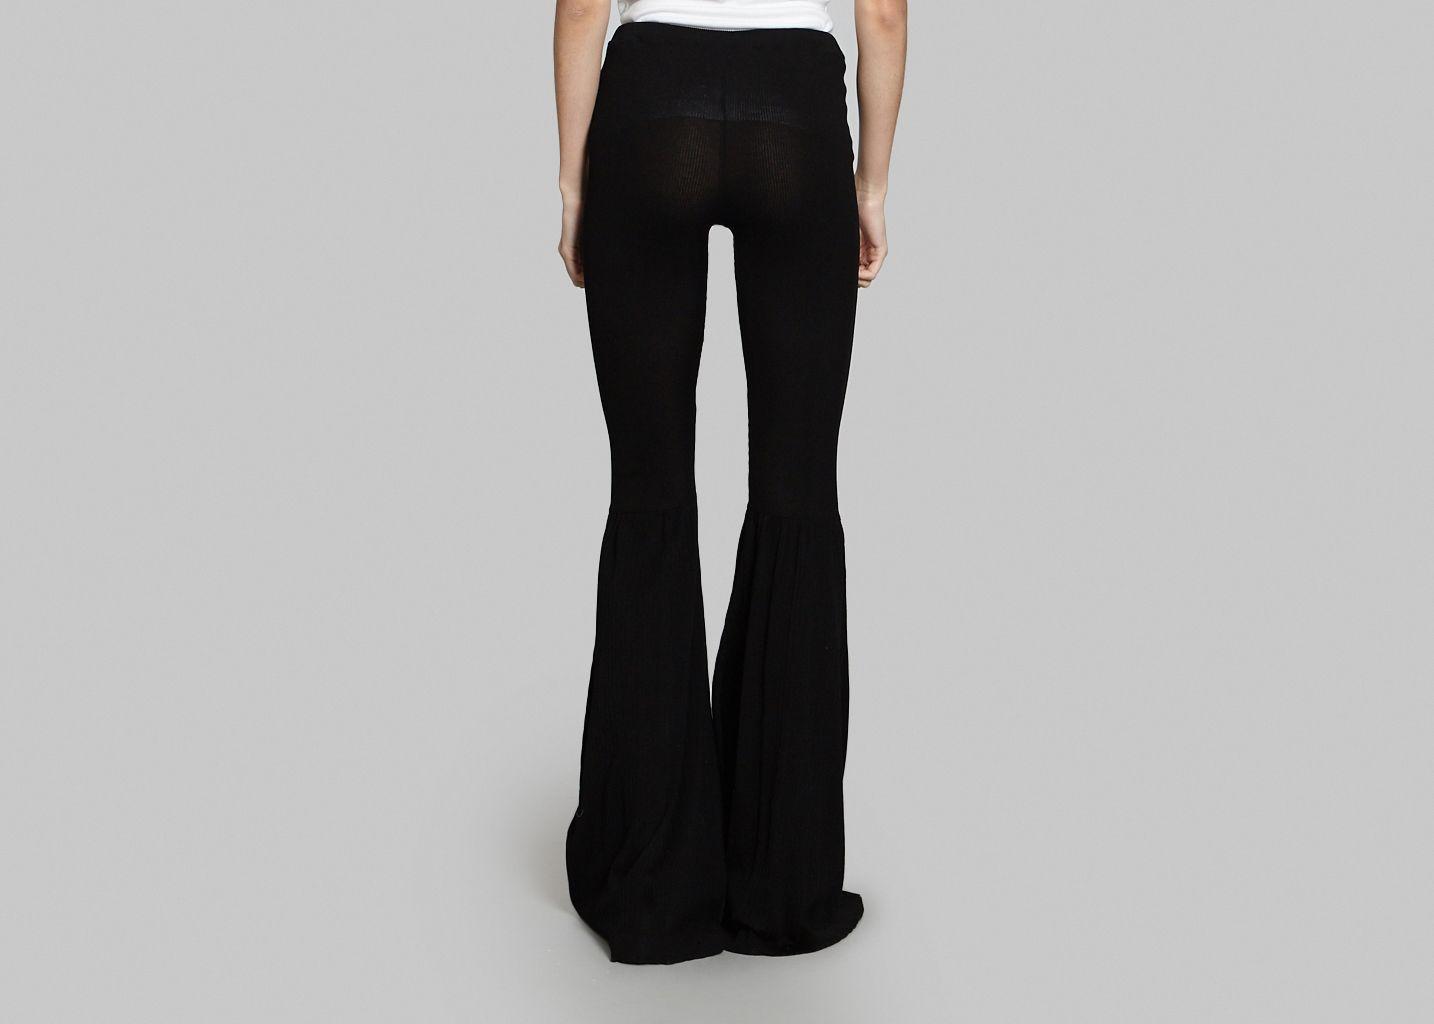 Pantalon Côtelé - Emmanuelle Khanh